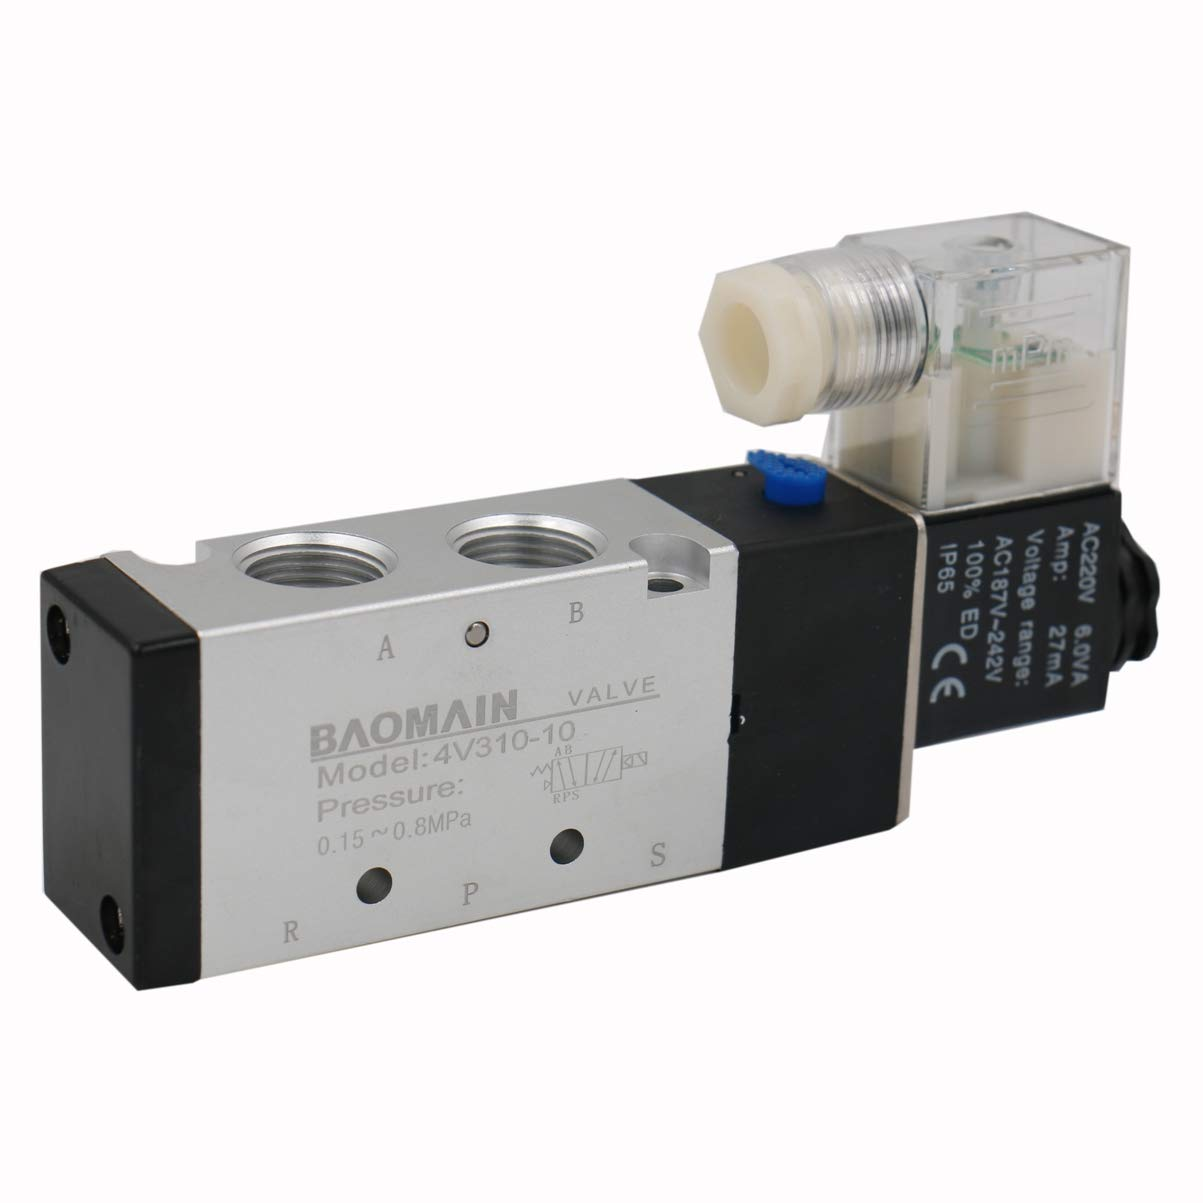 Baomain DC 24V 2 Port 2 Way 3//4PT Female Thread Pneumatic Electric Solenoid Valve